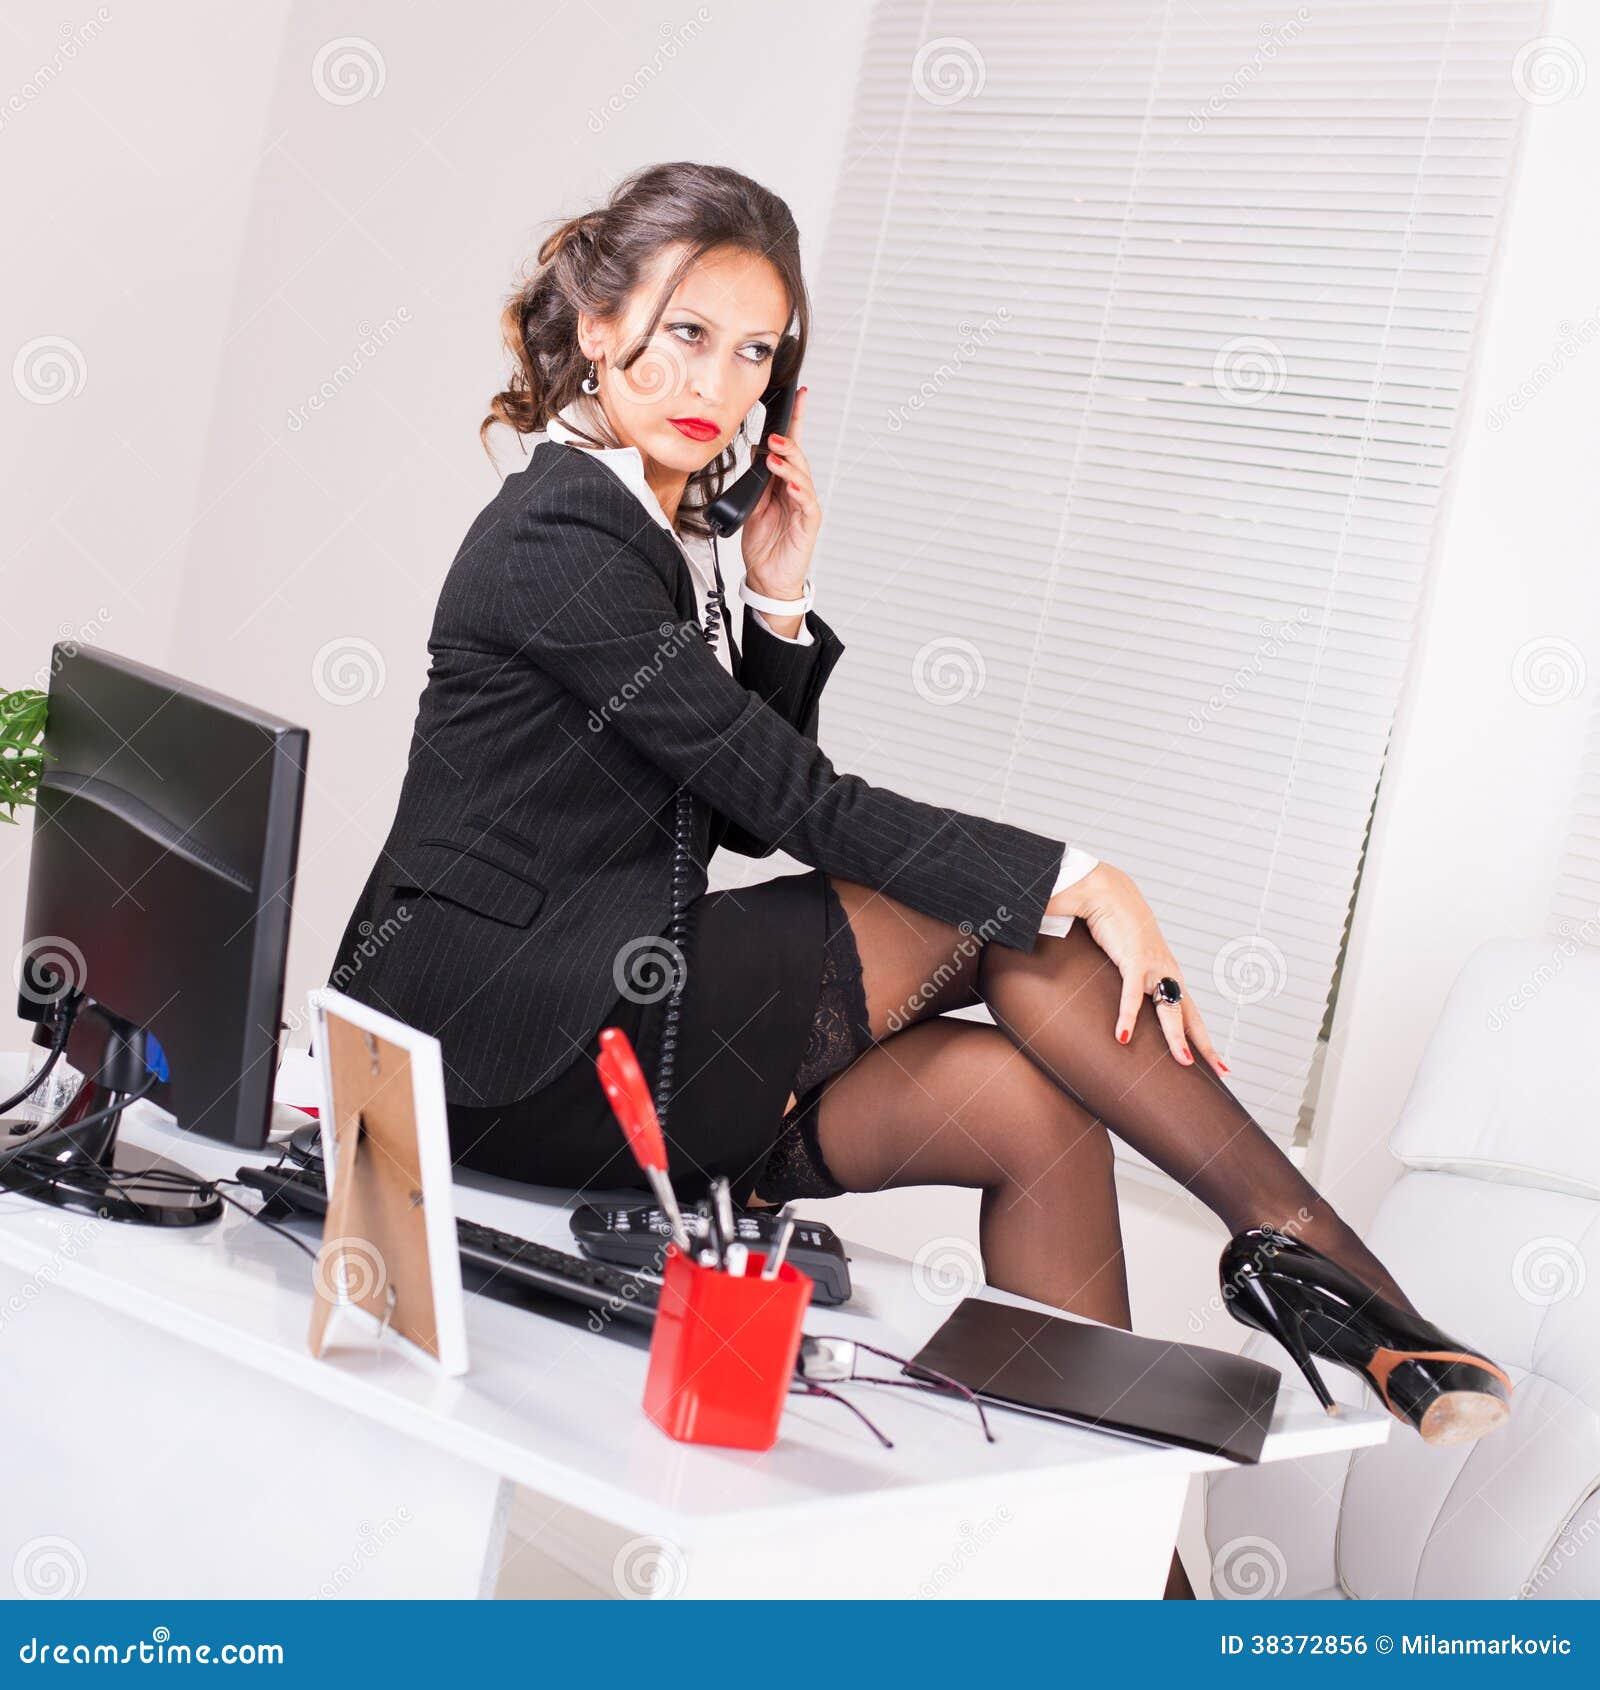 Secretary Stock Photo Image Of Flirting, Woman -9104